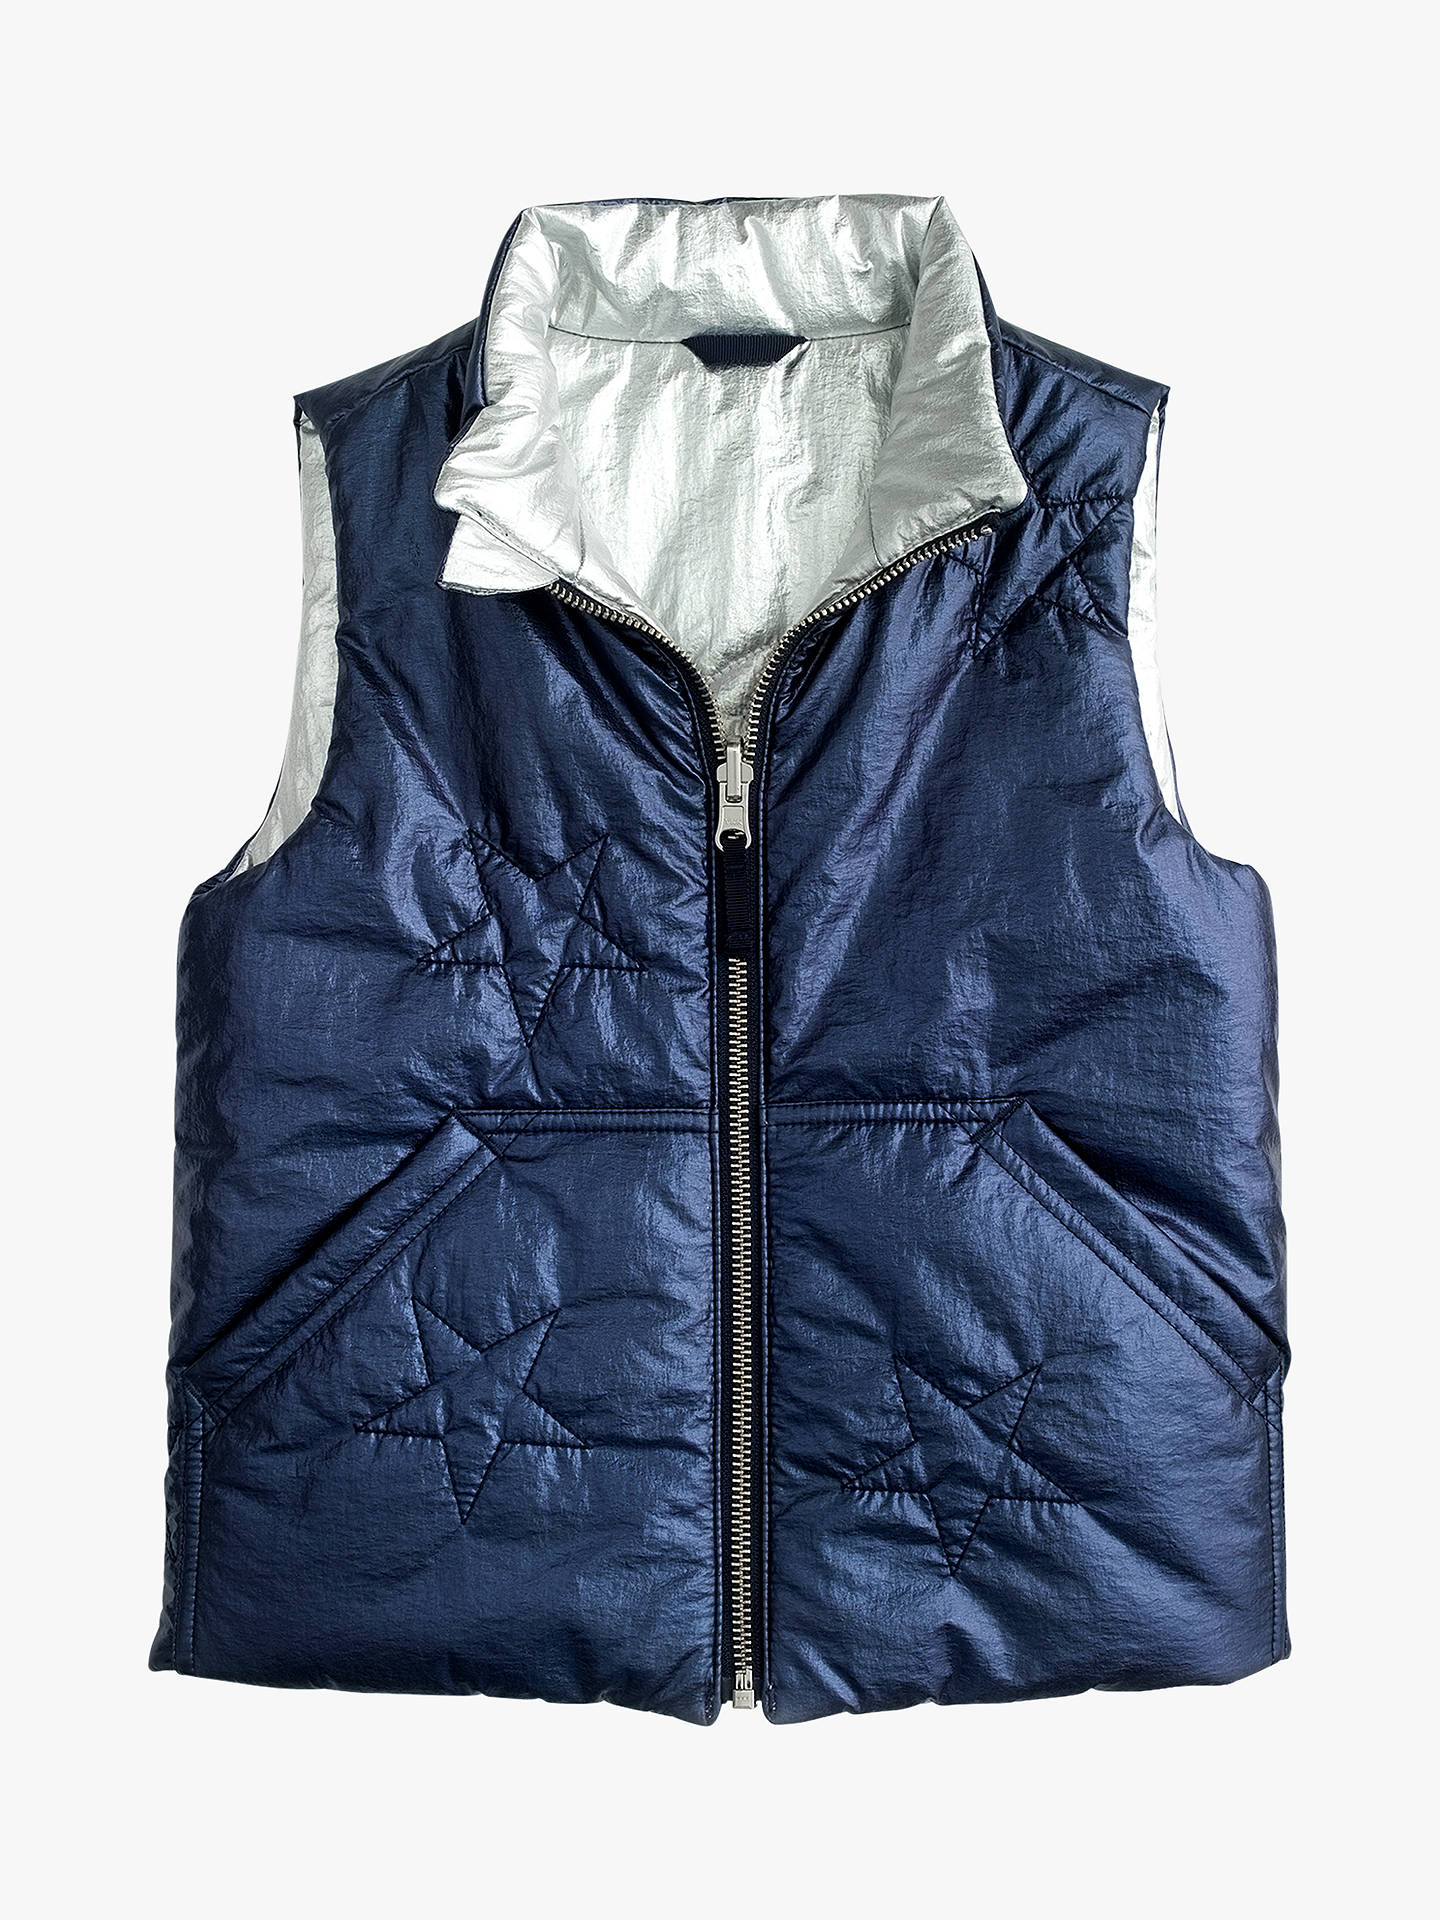 45783c9ece5f0 Buy crewcuts by J.Crew Girls' Reversible Metallic Padded Vest, Navy/Silver  ...